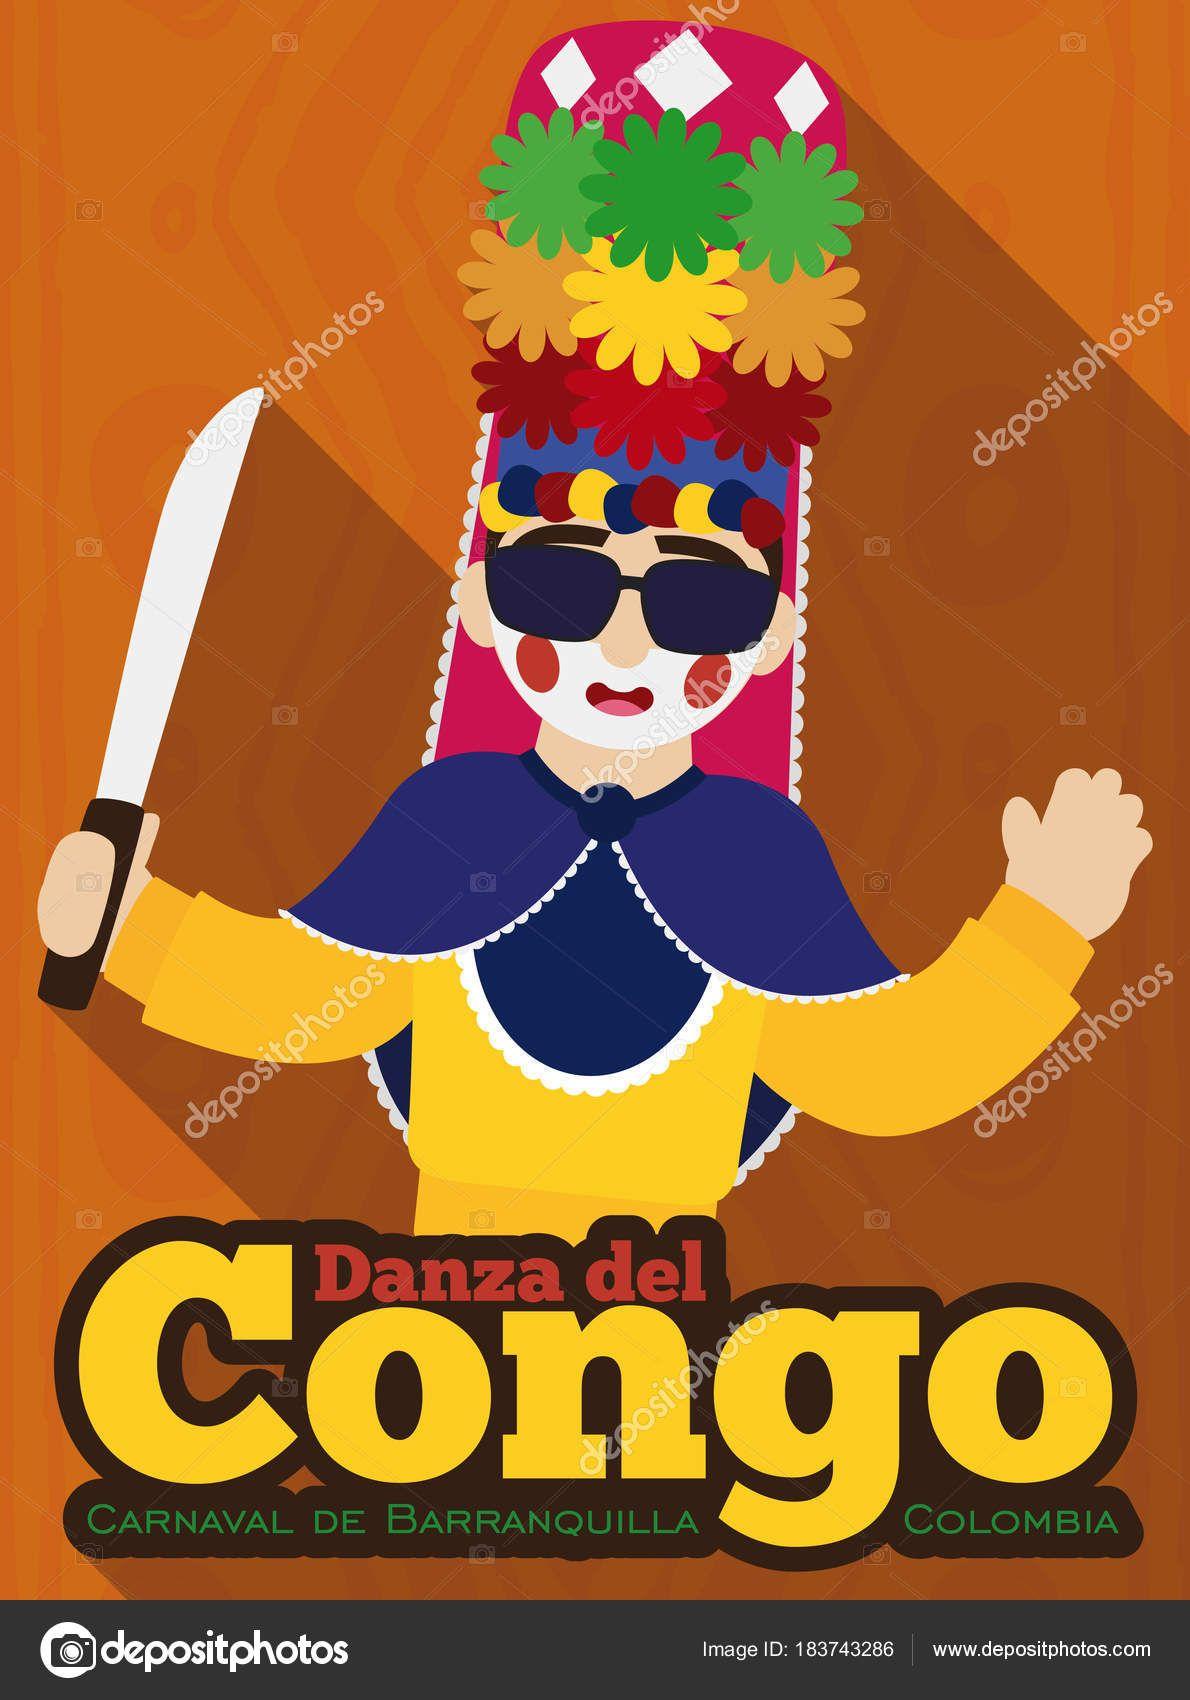 Pin De P A En Cb Carnaval Barranquilla Carrozas De Carnaval Carnaval